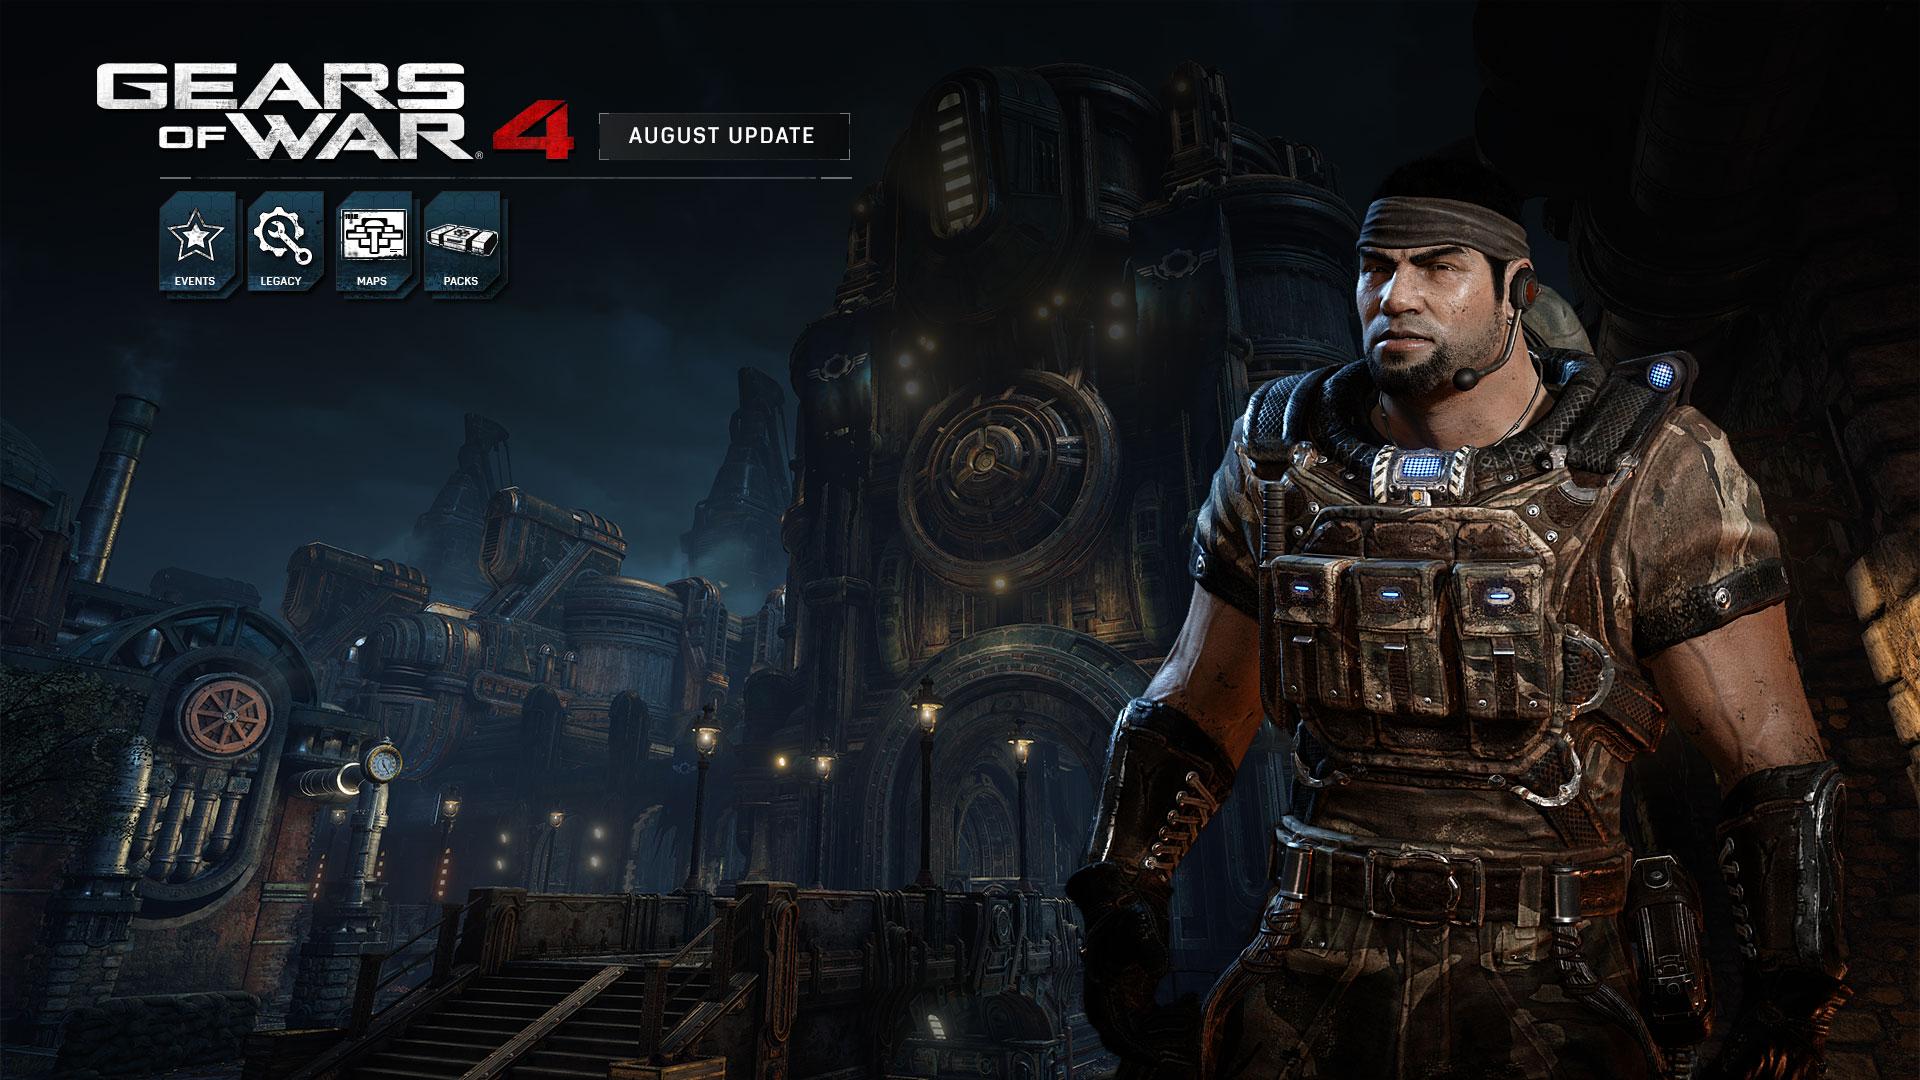 podremos1-jugar-mapa-del-primer-gears-of-war-gears-of-war-4-frikigamers.com